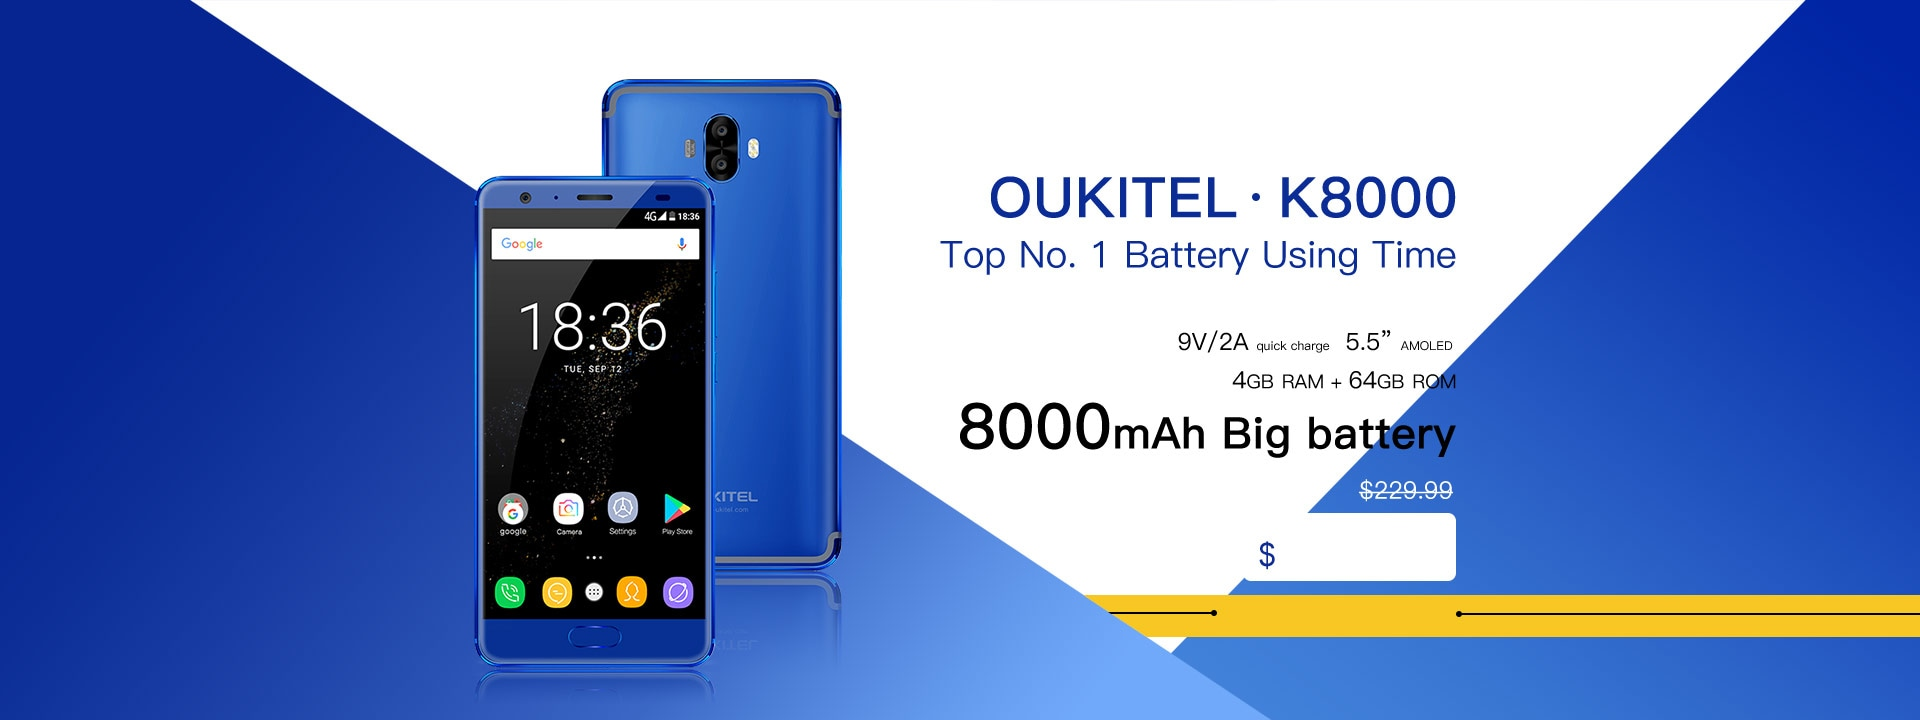 oukitel_k8000_1.jpg